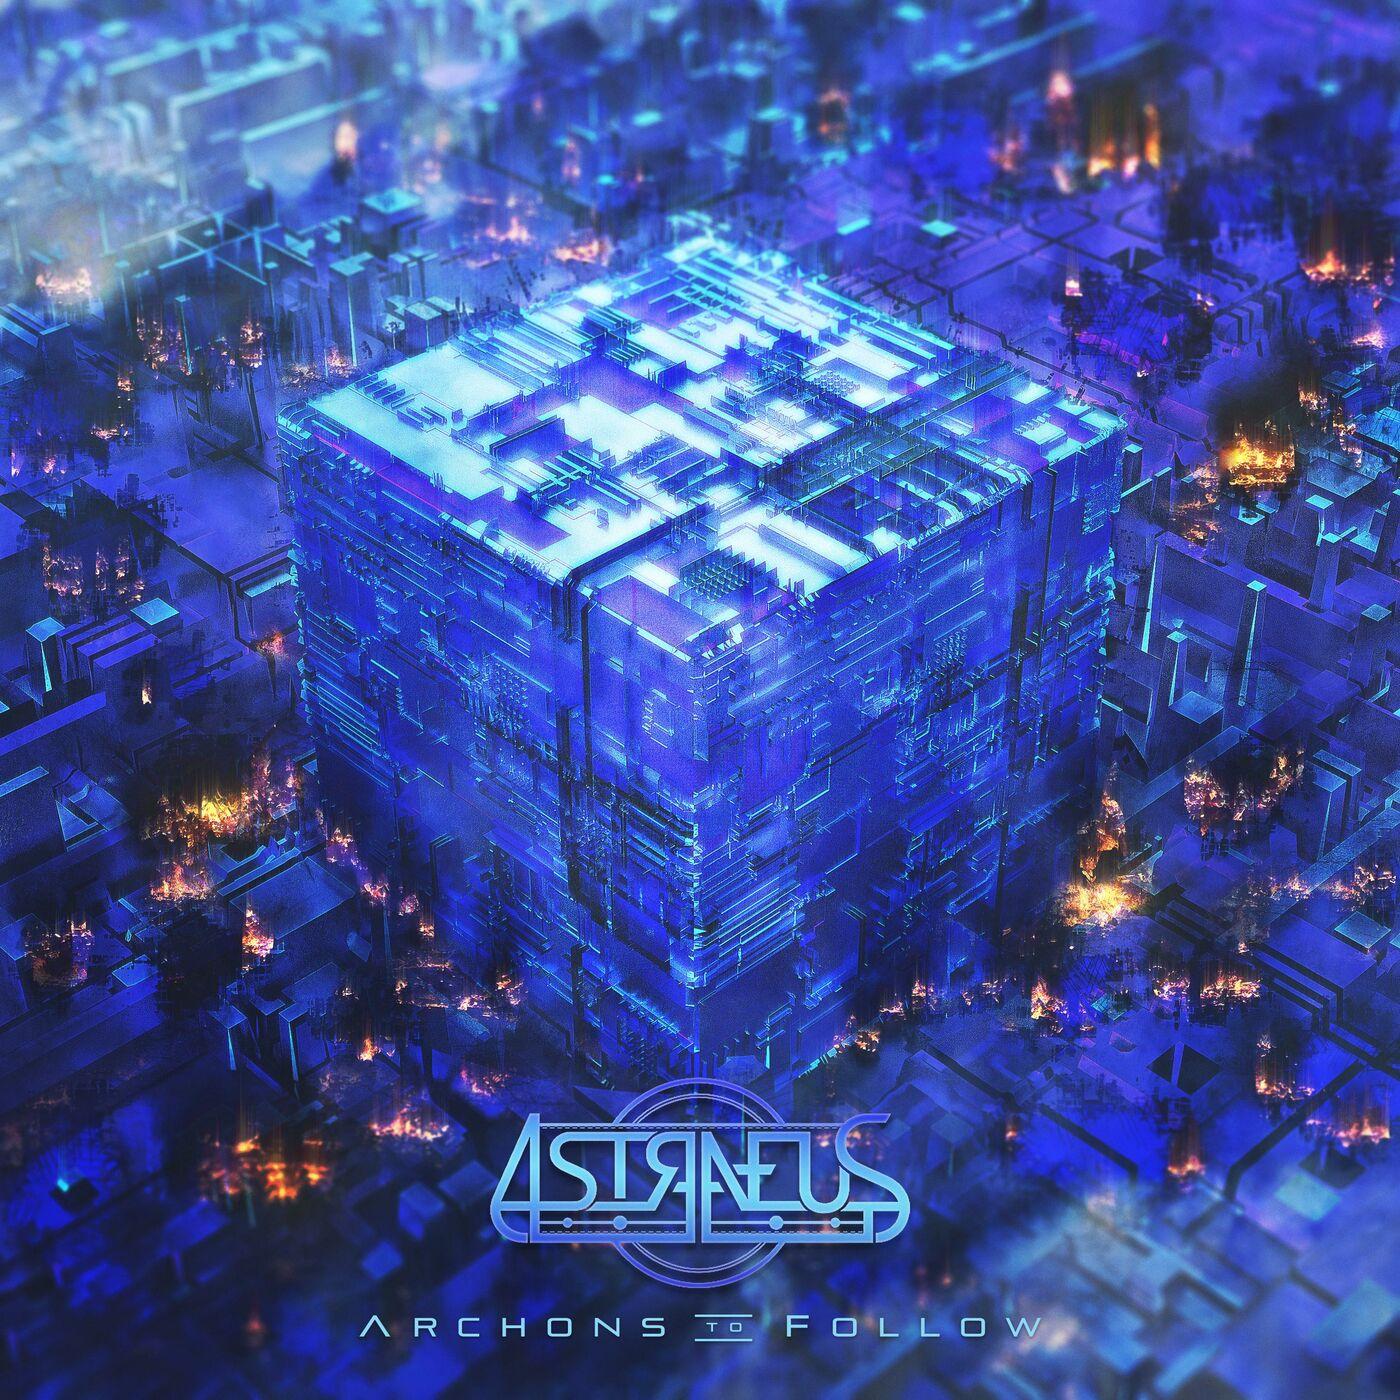 Astraeus - Lilith [single] (2020)